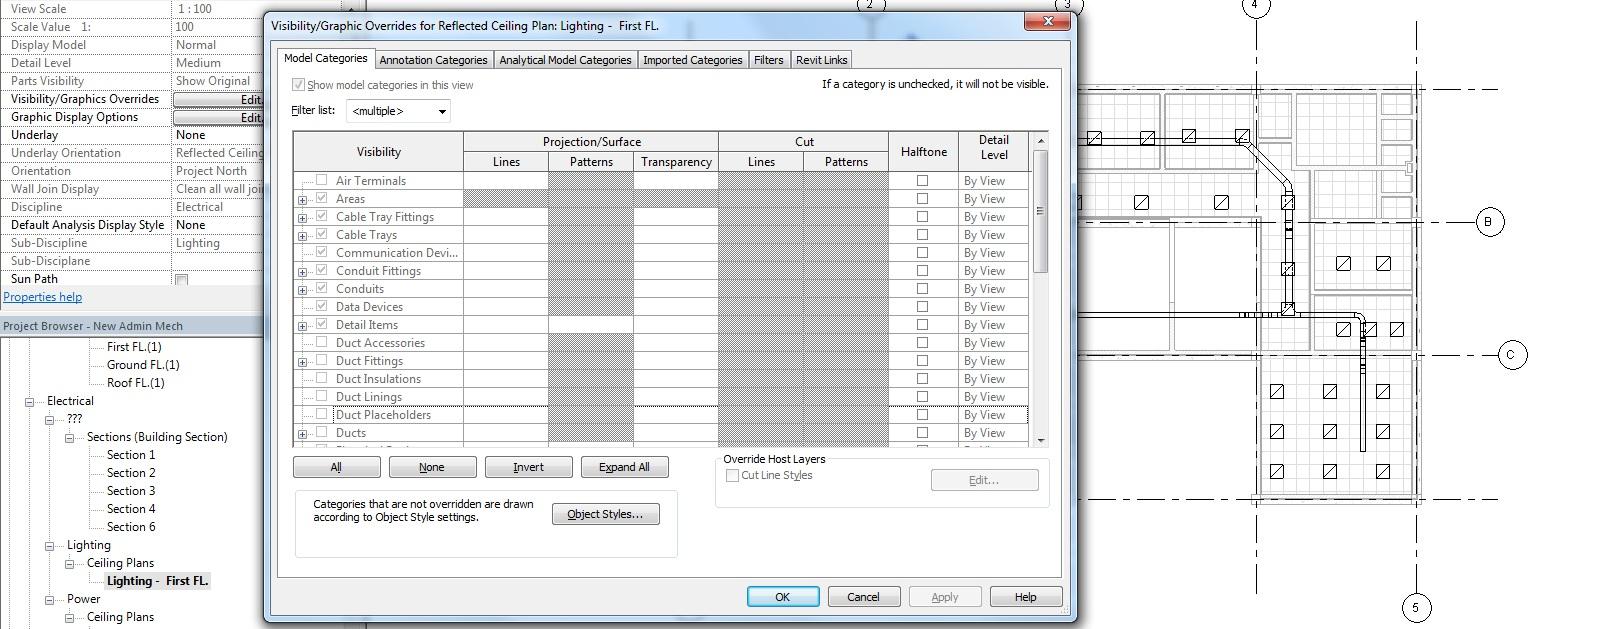 revit mep view templates issues 3 jpg [ 1616 x 629 Pixel ]